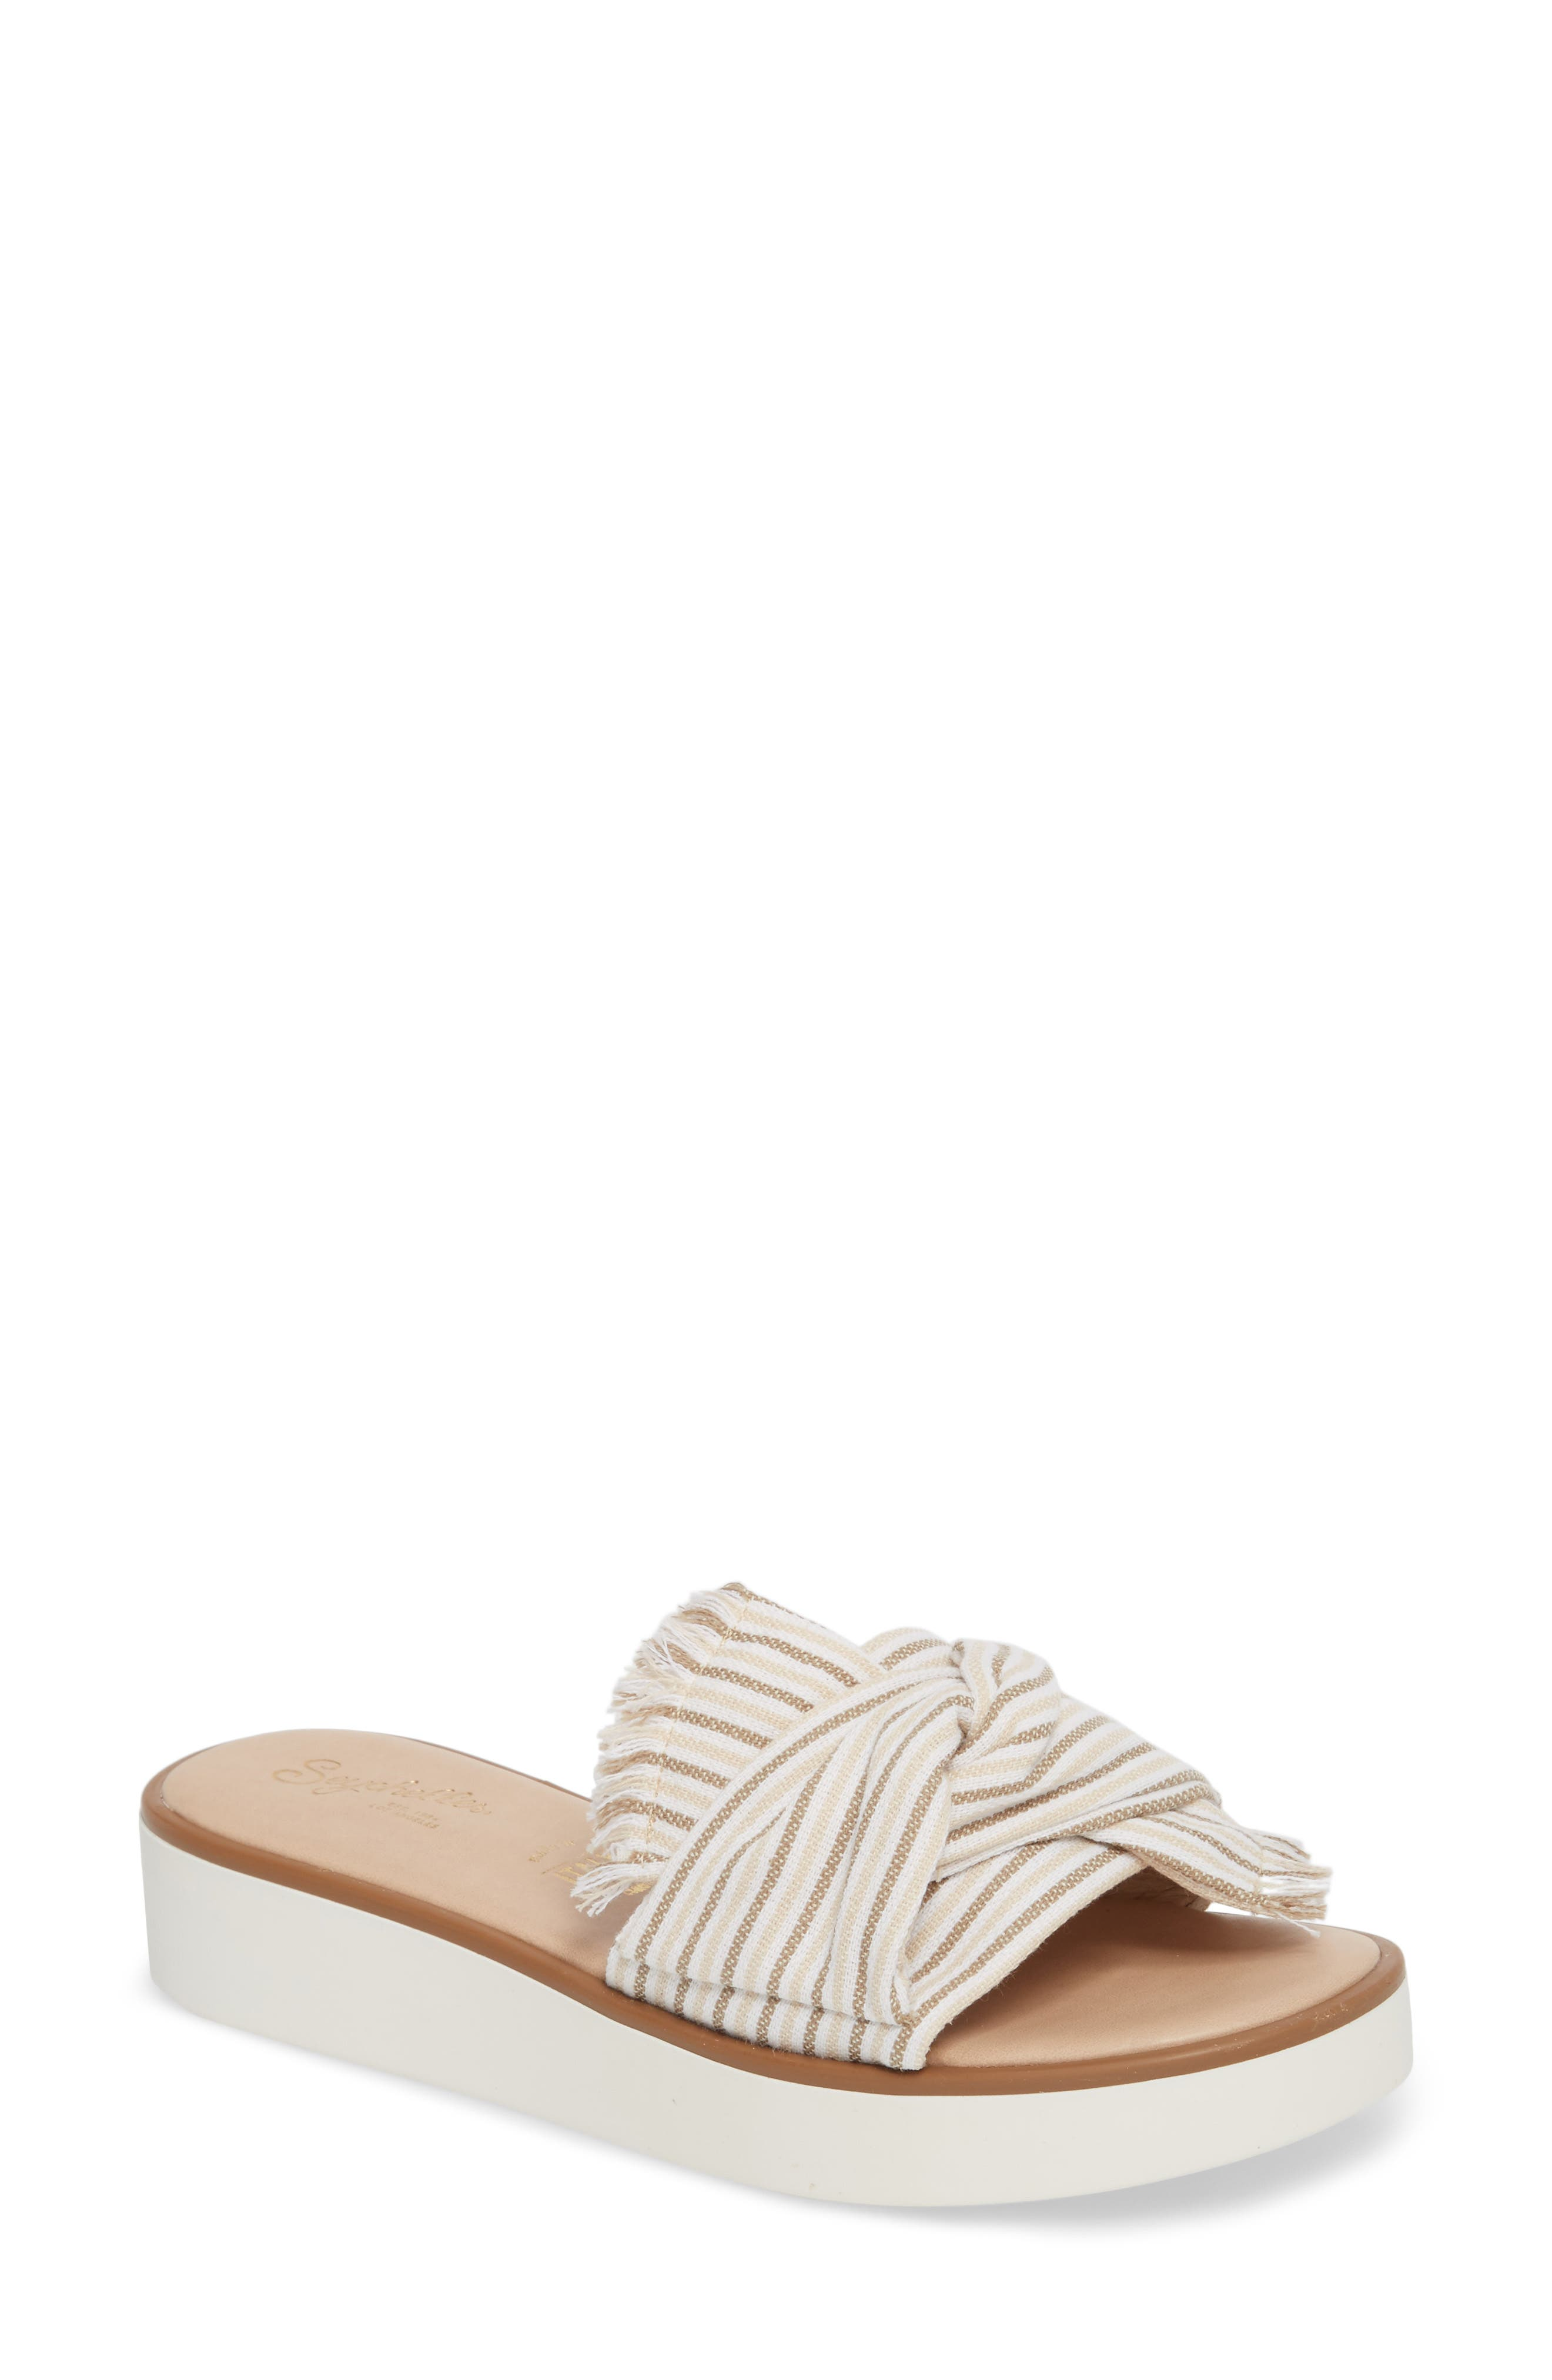 Coast II Slide Sandal,                         Main,                         color, 250